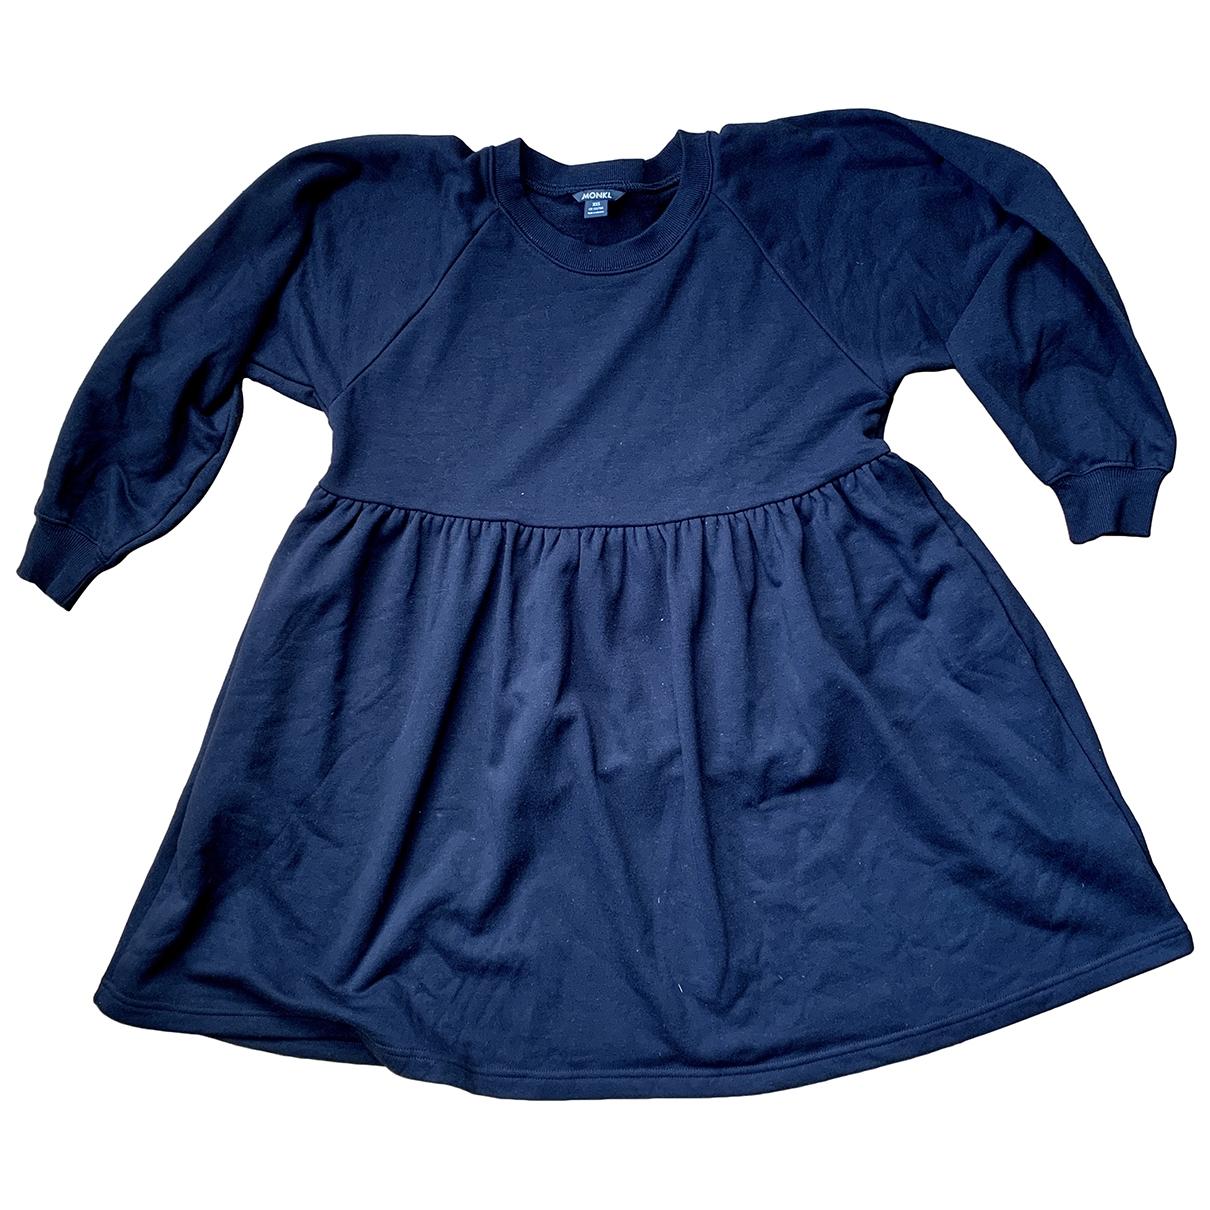 Monki \N Kleid in  Schwarz Baumwolle